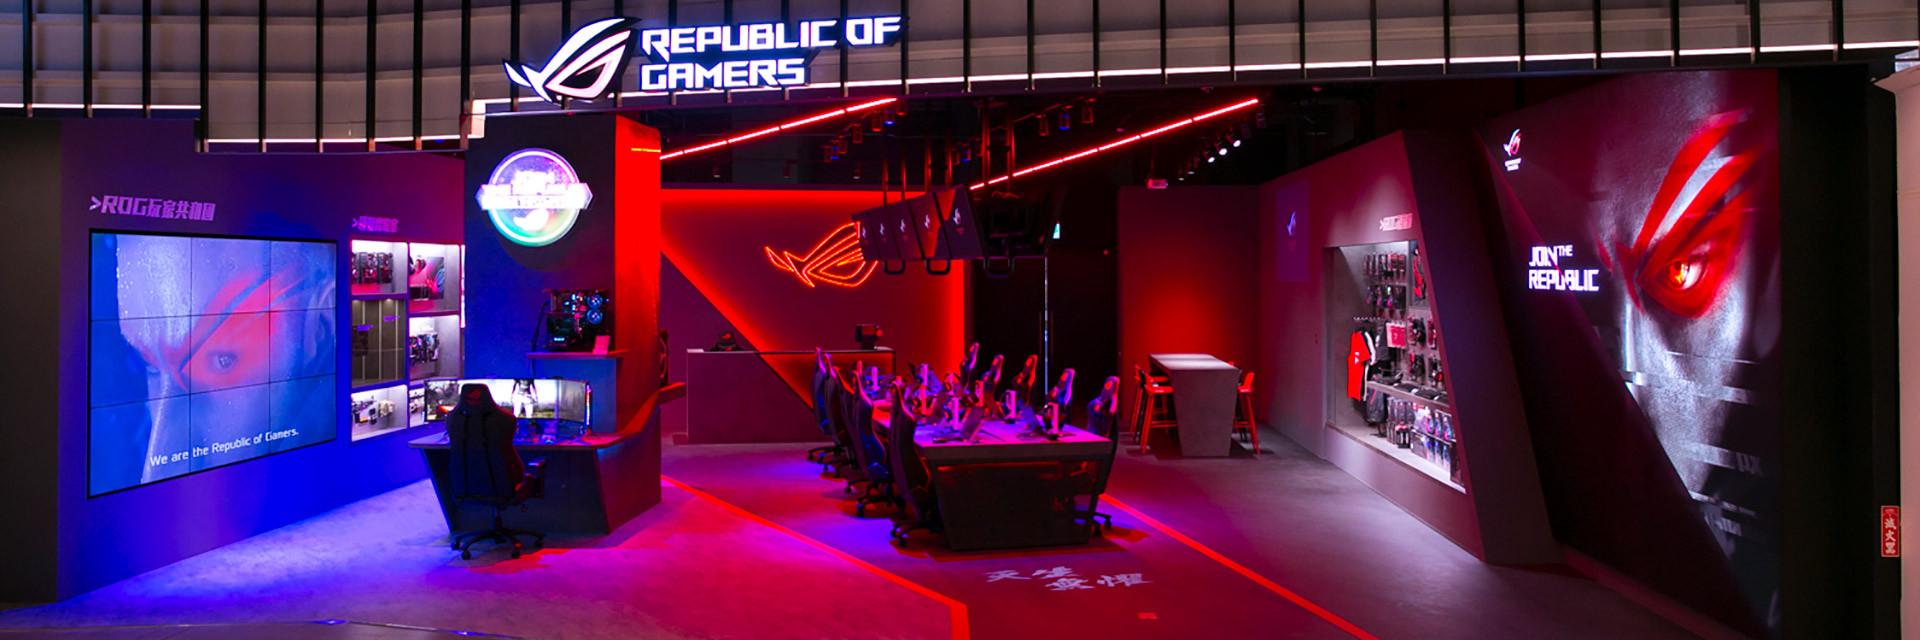 ROG 打造頂級電競神域!再推高規輕薄電競筆電 Zephyrus M 西風之神